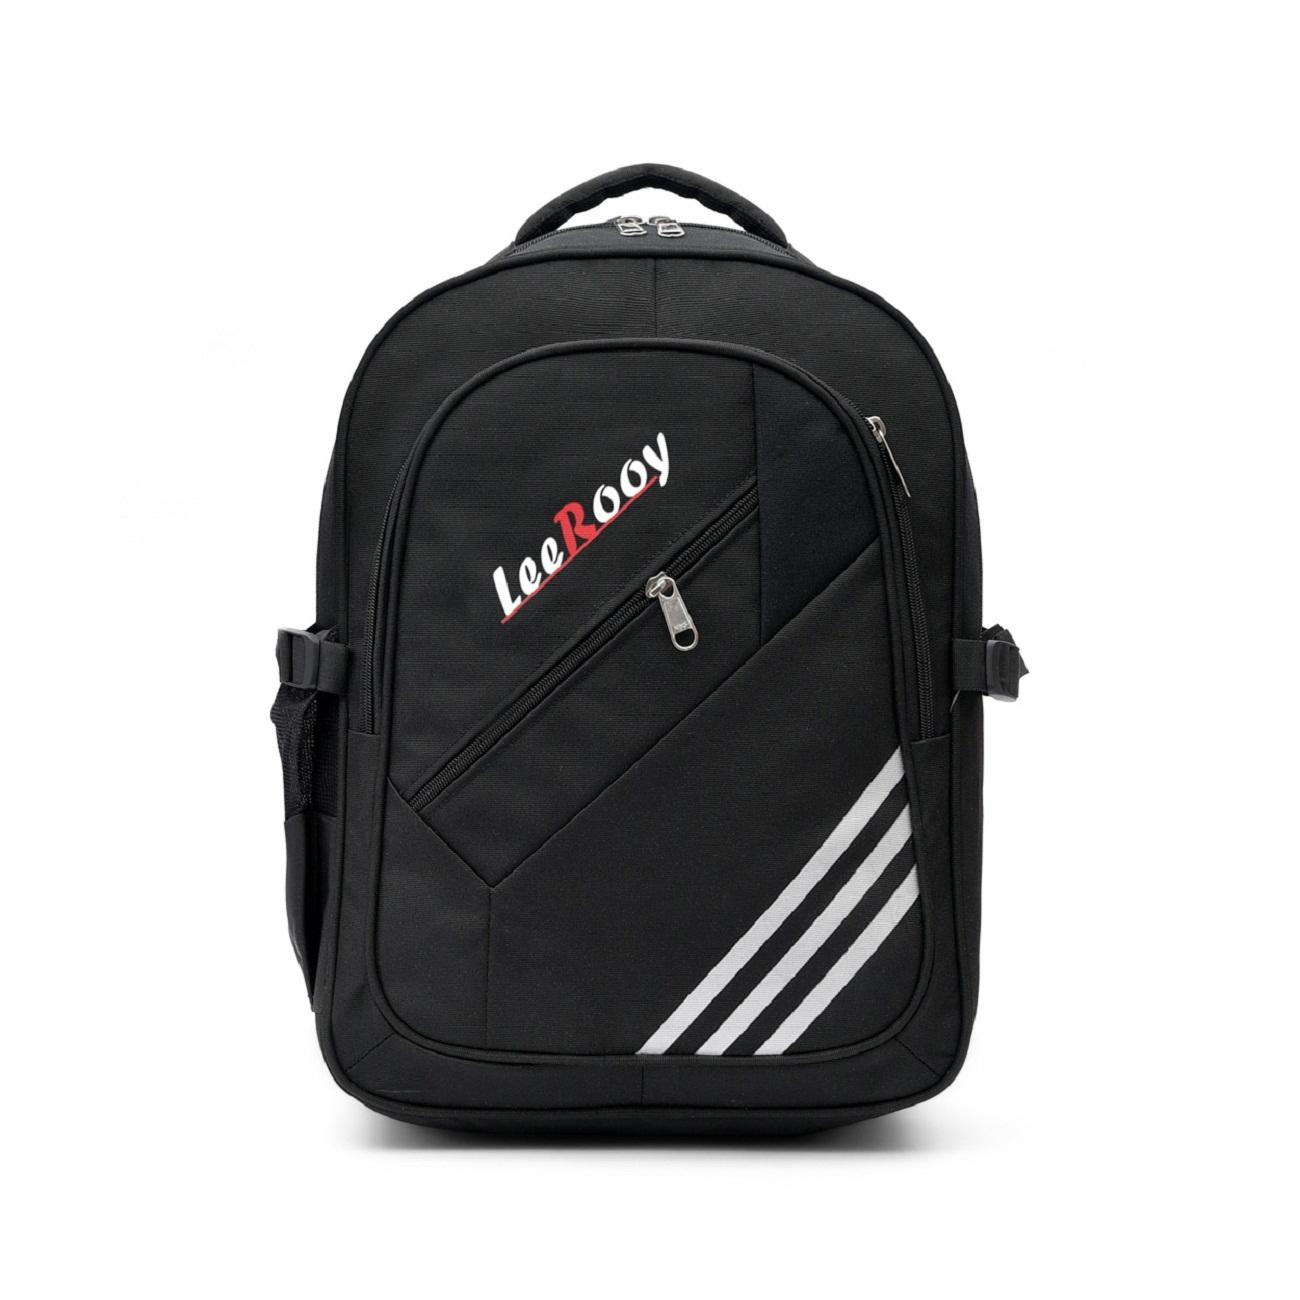 LeeRooy 25 L Black Laptop Bag for Women and Men Backpacks for Girls Boys Stylish Trending Bagpack School Bag